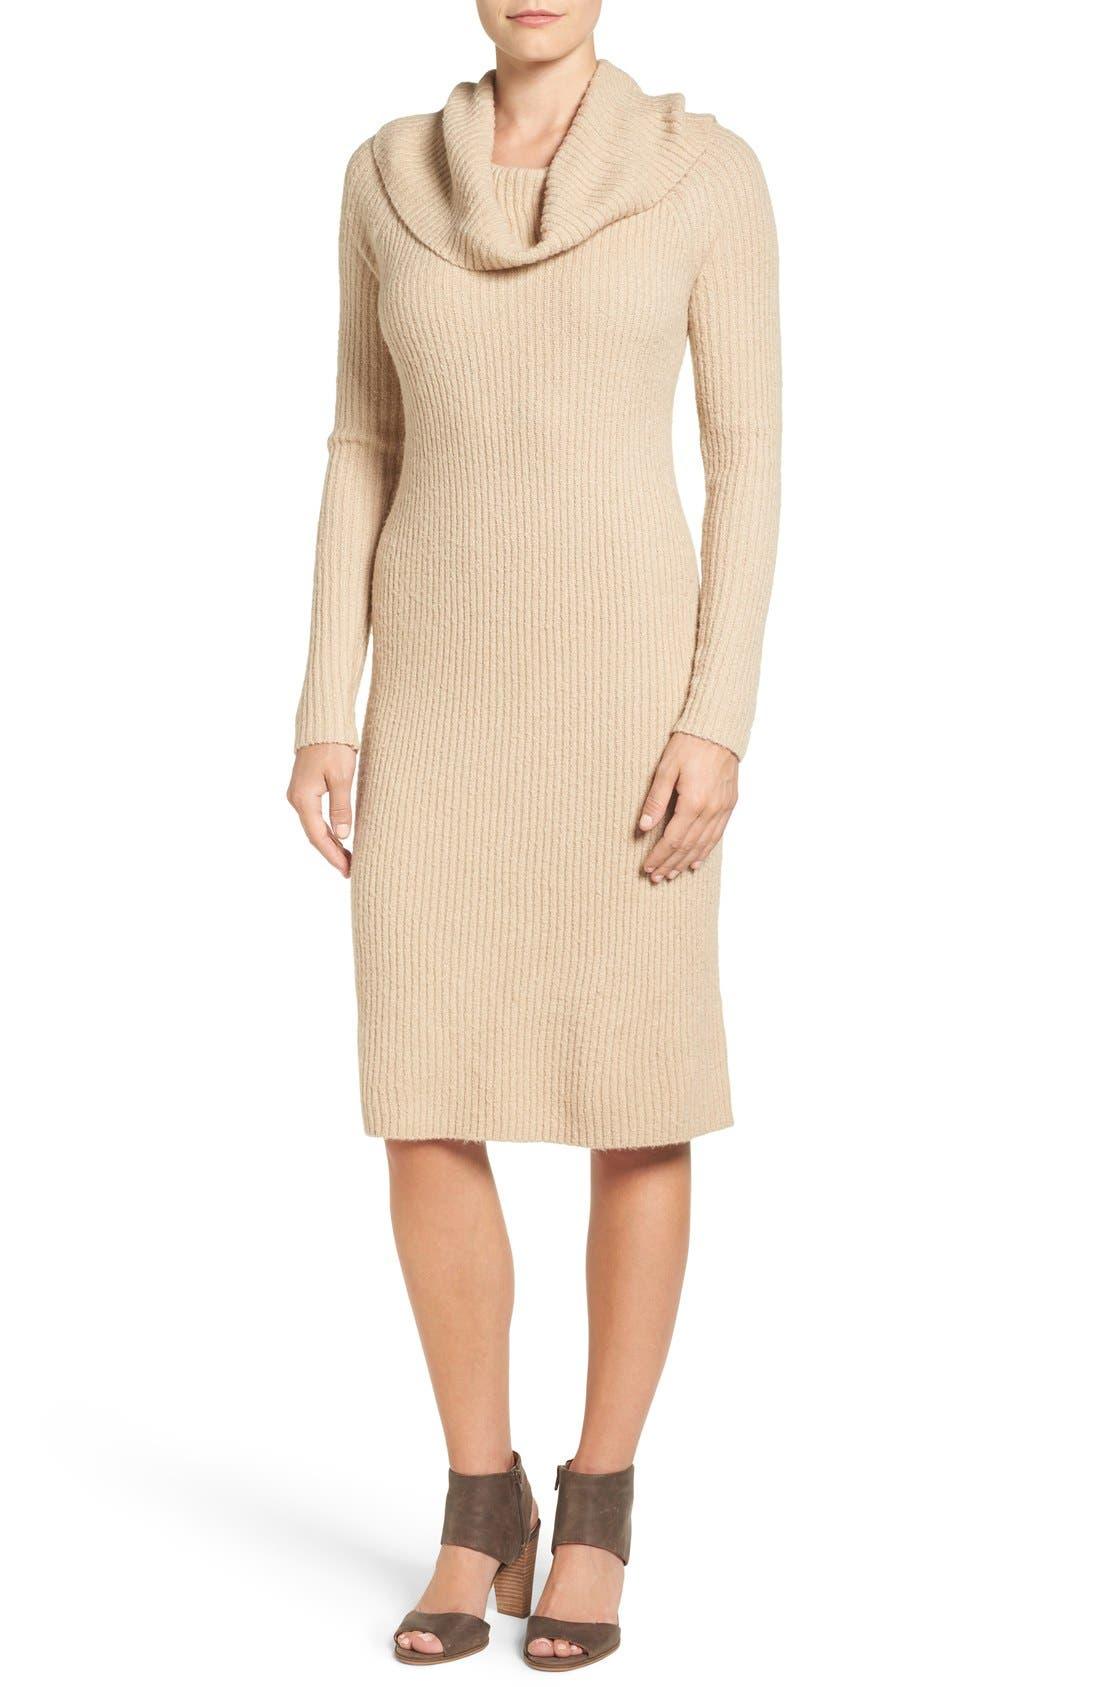 Alternate Image 1 Selected - Halogen® Cowl Neck Sweater Dress (Regular & Petite)